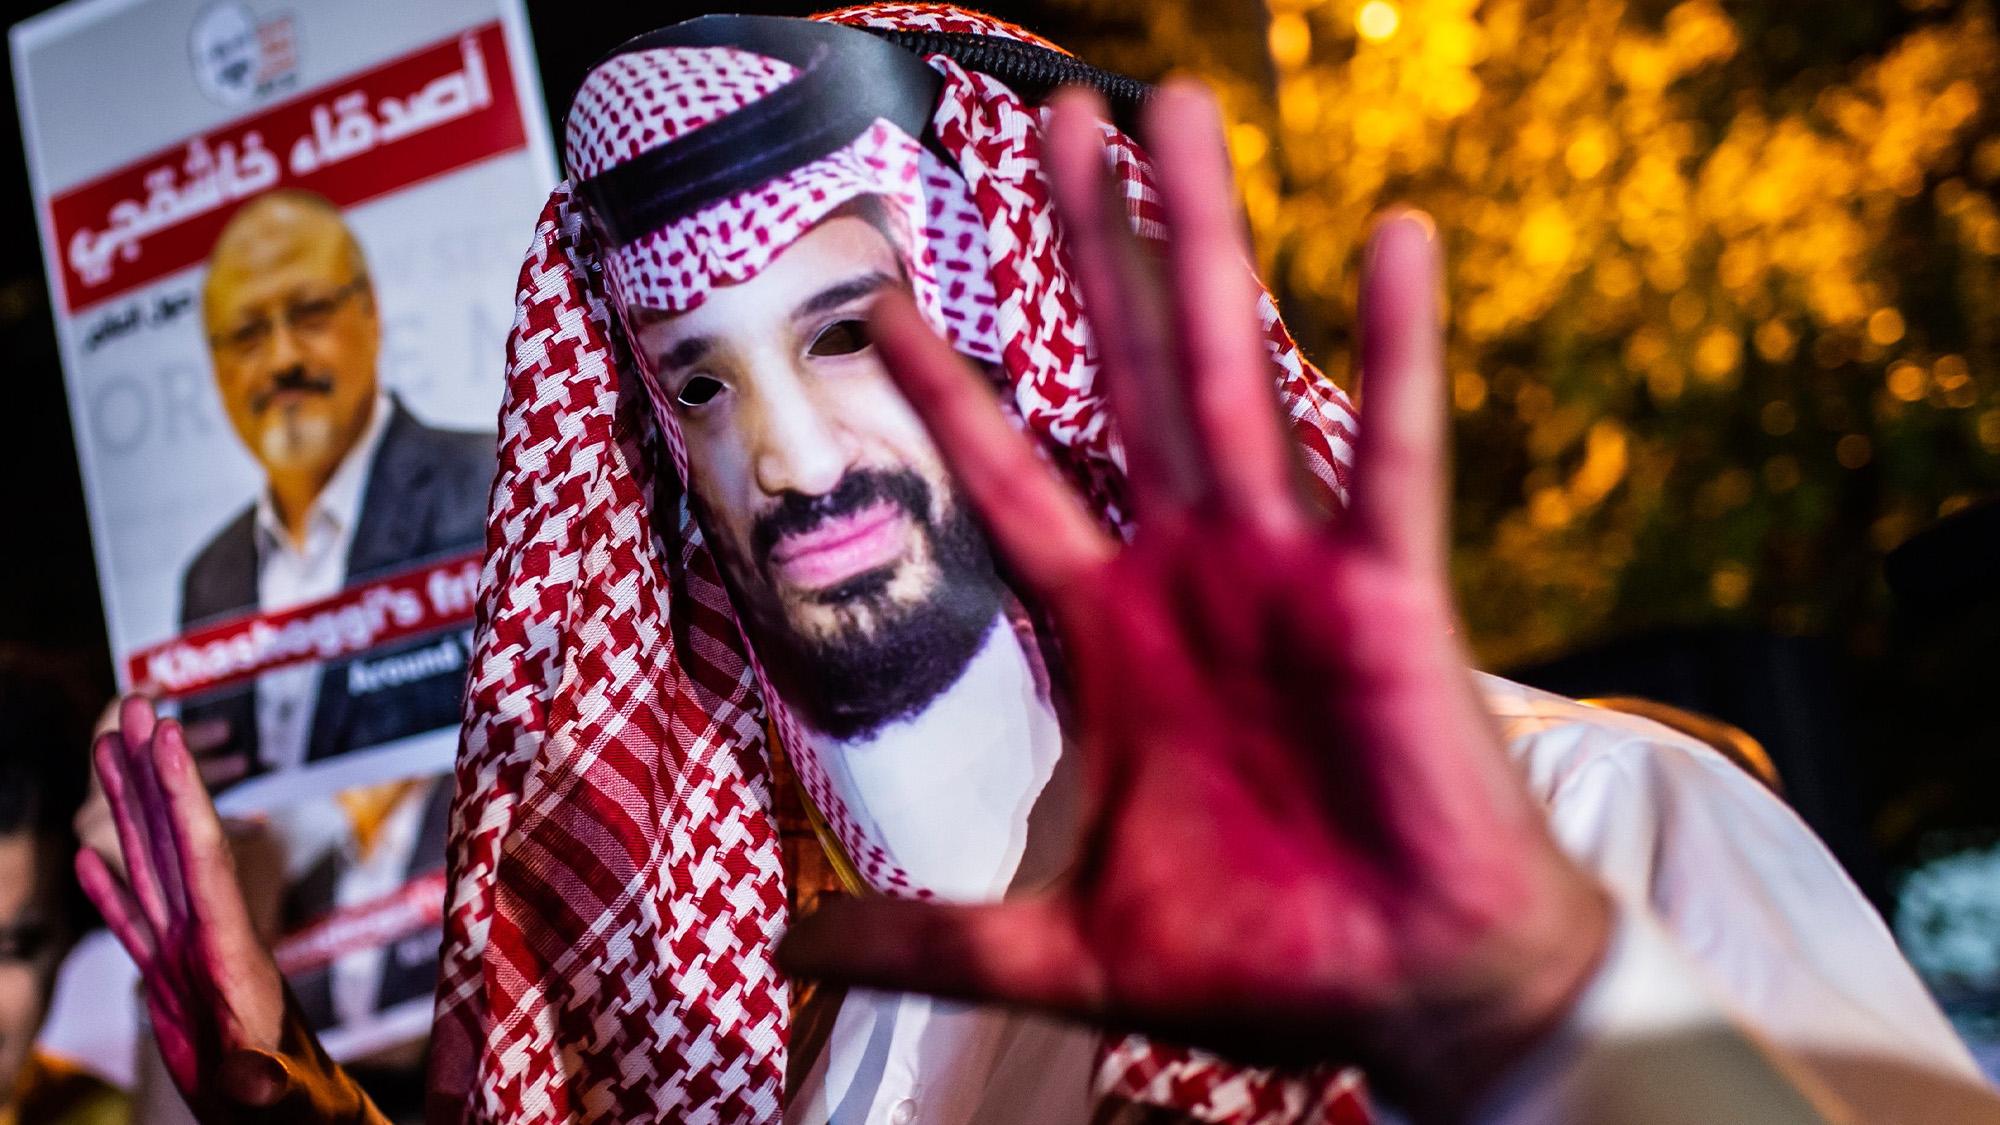 Jamal Khashoggi protestor